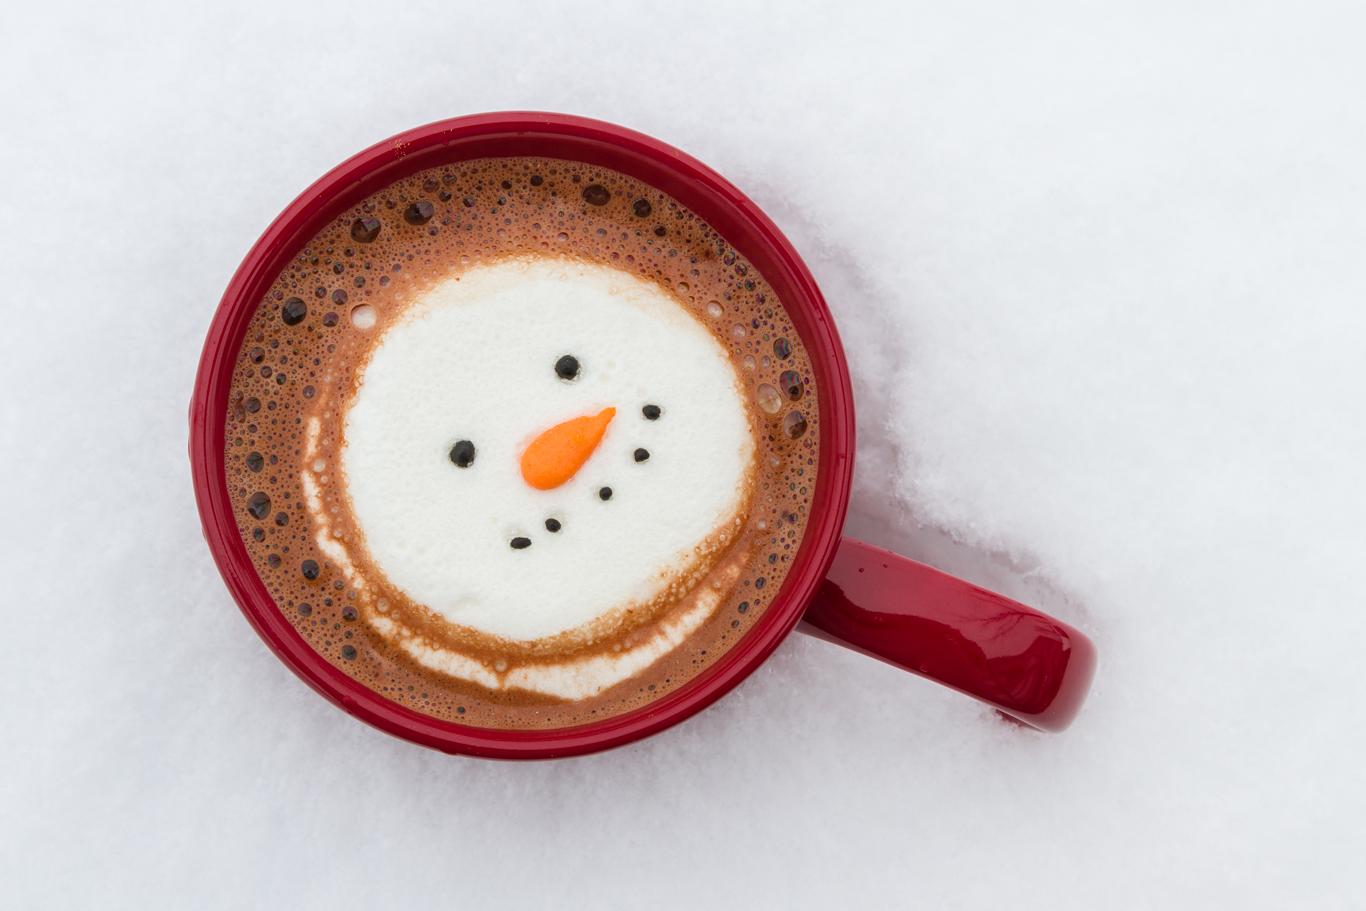 Hot-Chocolate-1366-0221